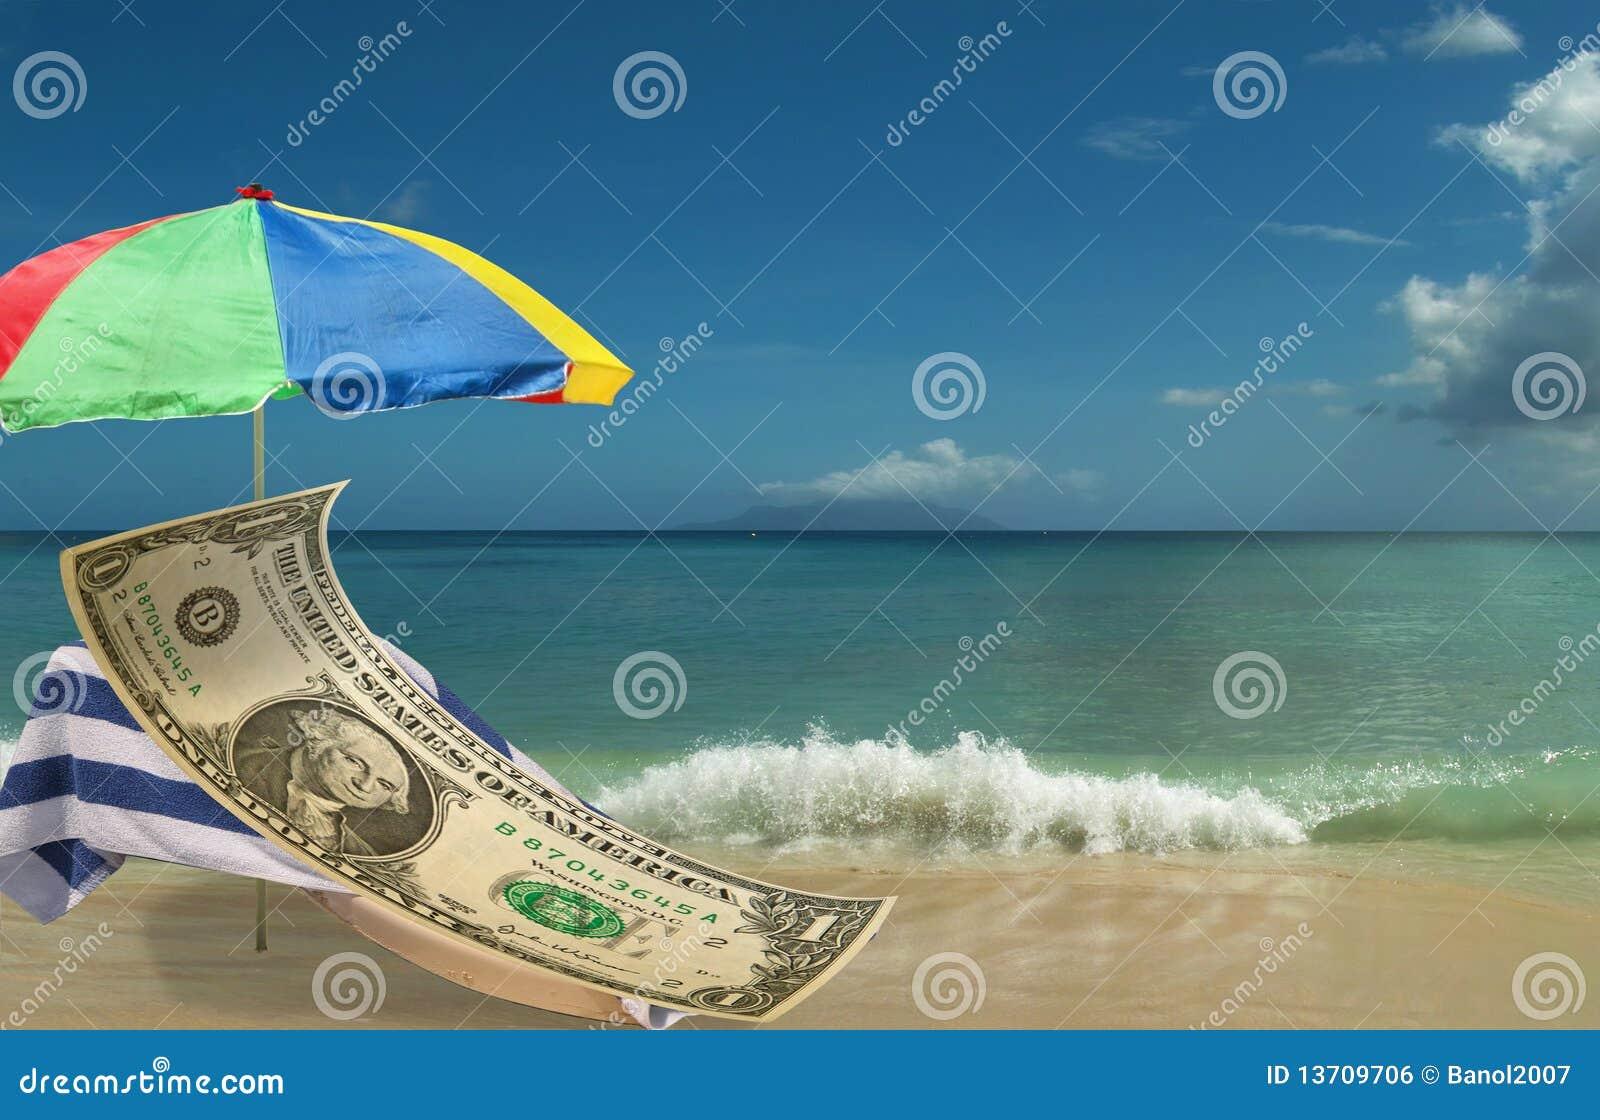 US Dollar is resting & enjoing paradice beach